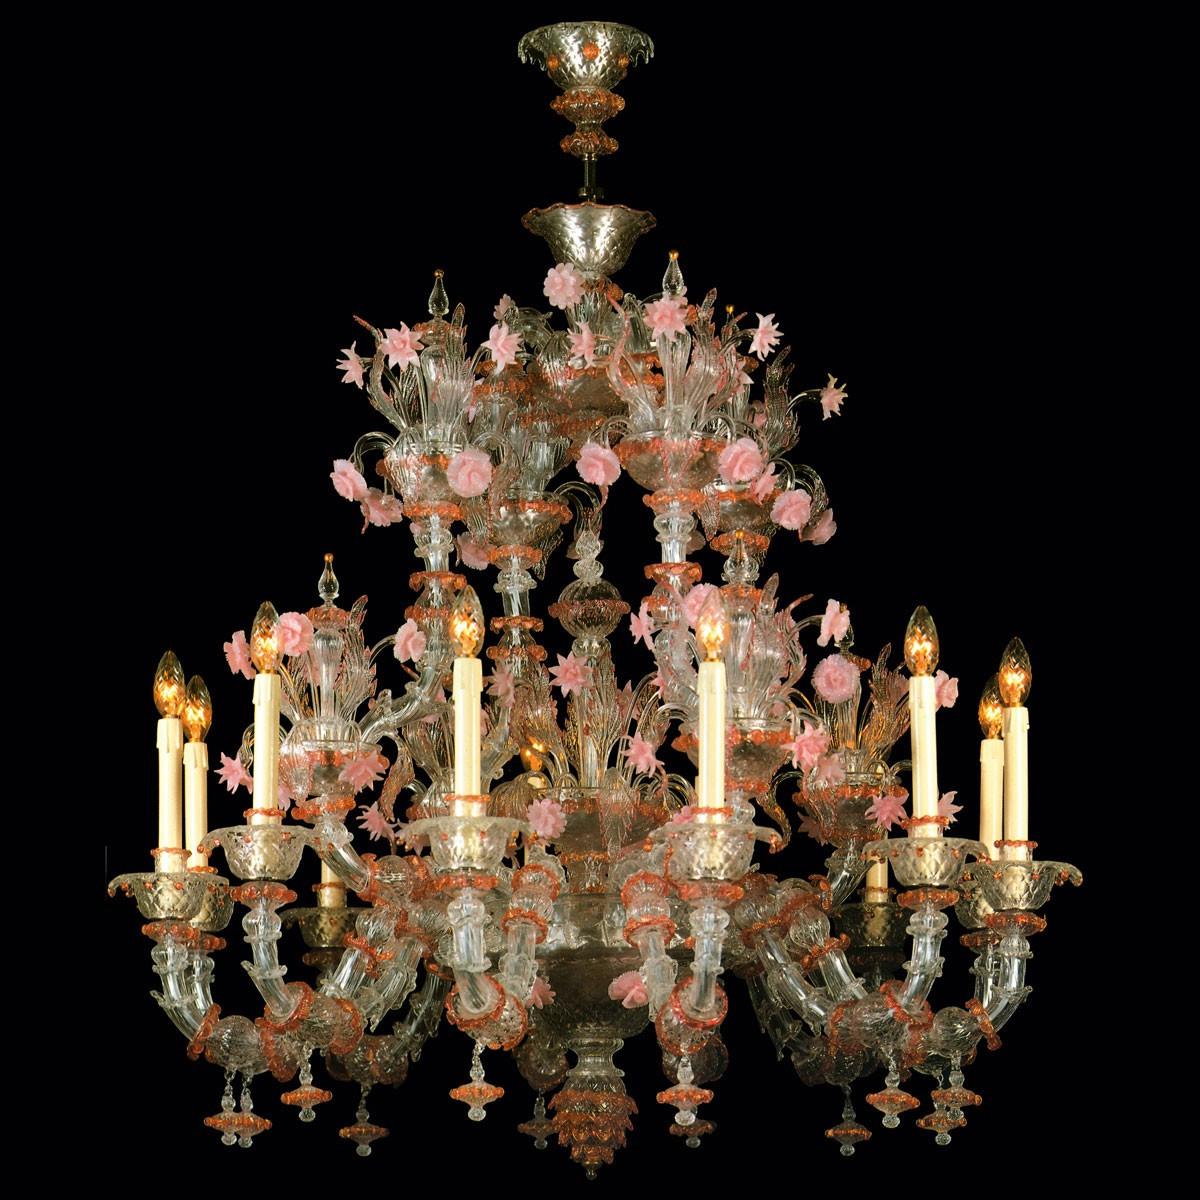 """Charlotte"" Murano glass chandelier - 12 lights"